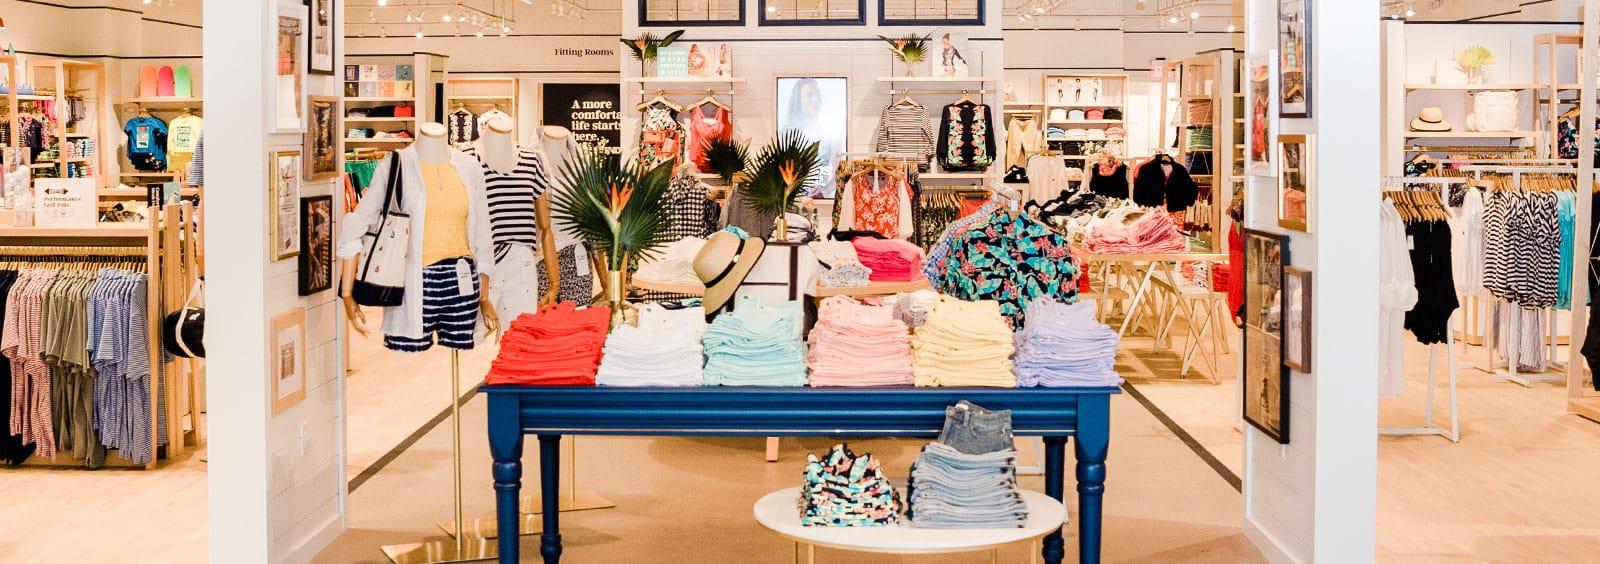 Lands' End retail store